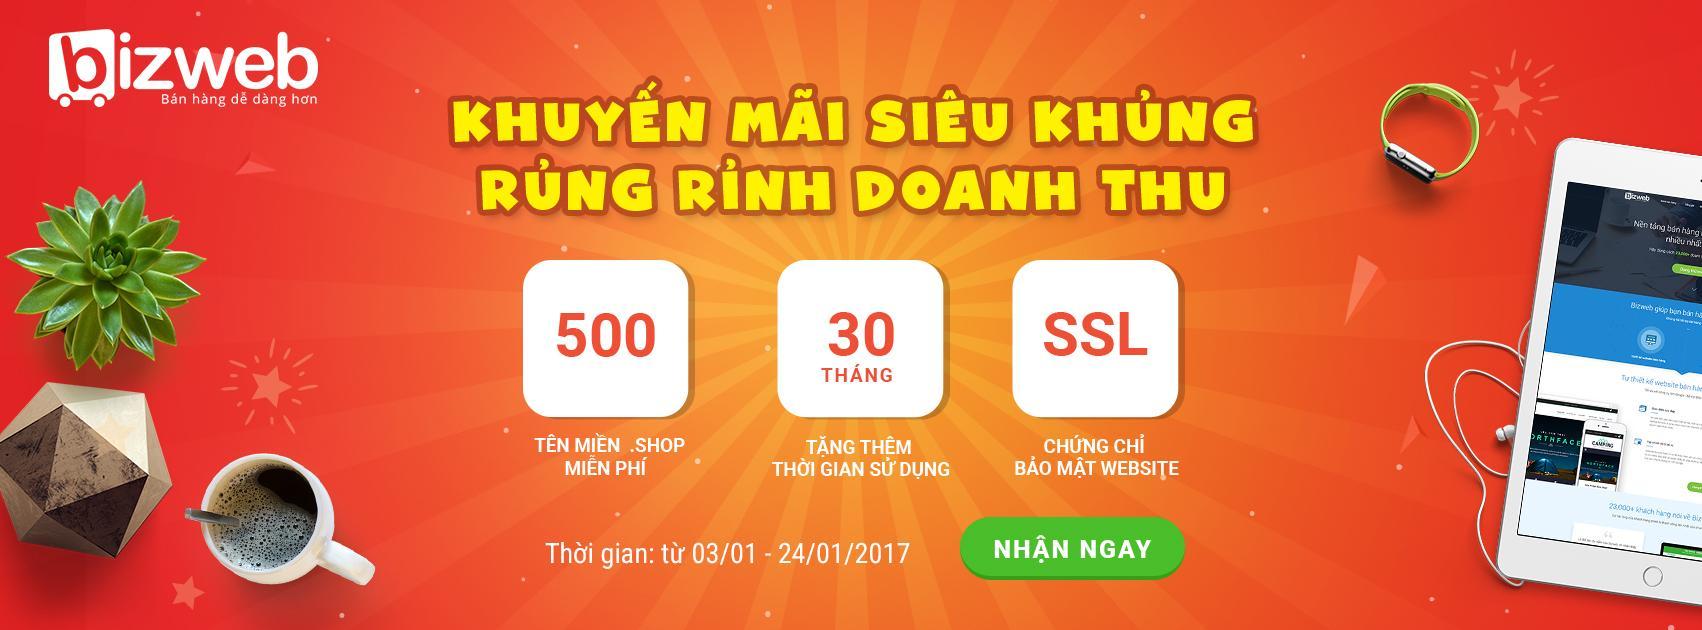 khuyen-mai-sieu-khung-rung-rinh-doanh-thu-3